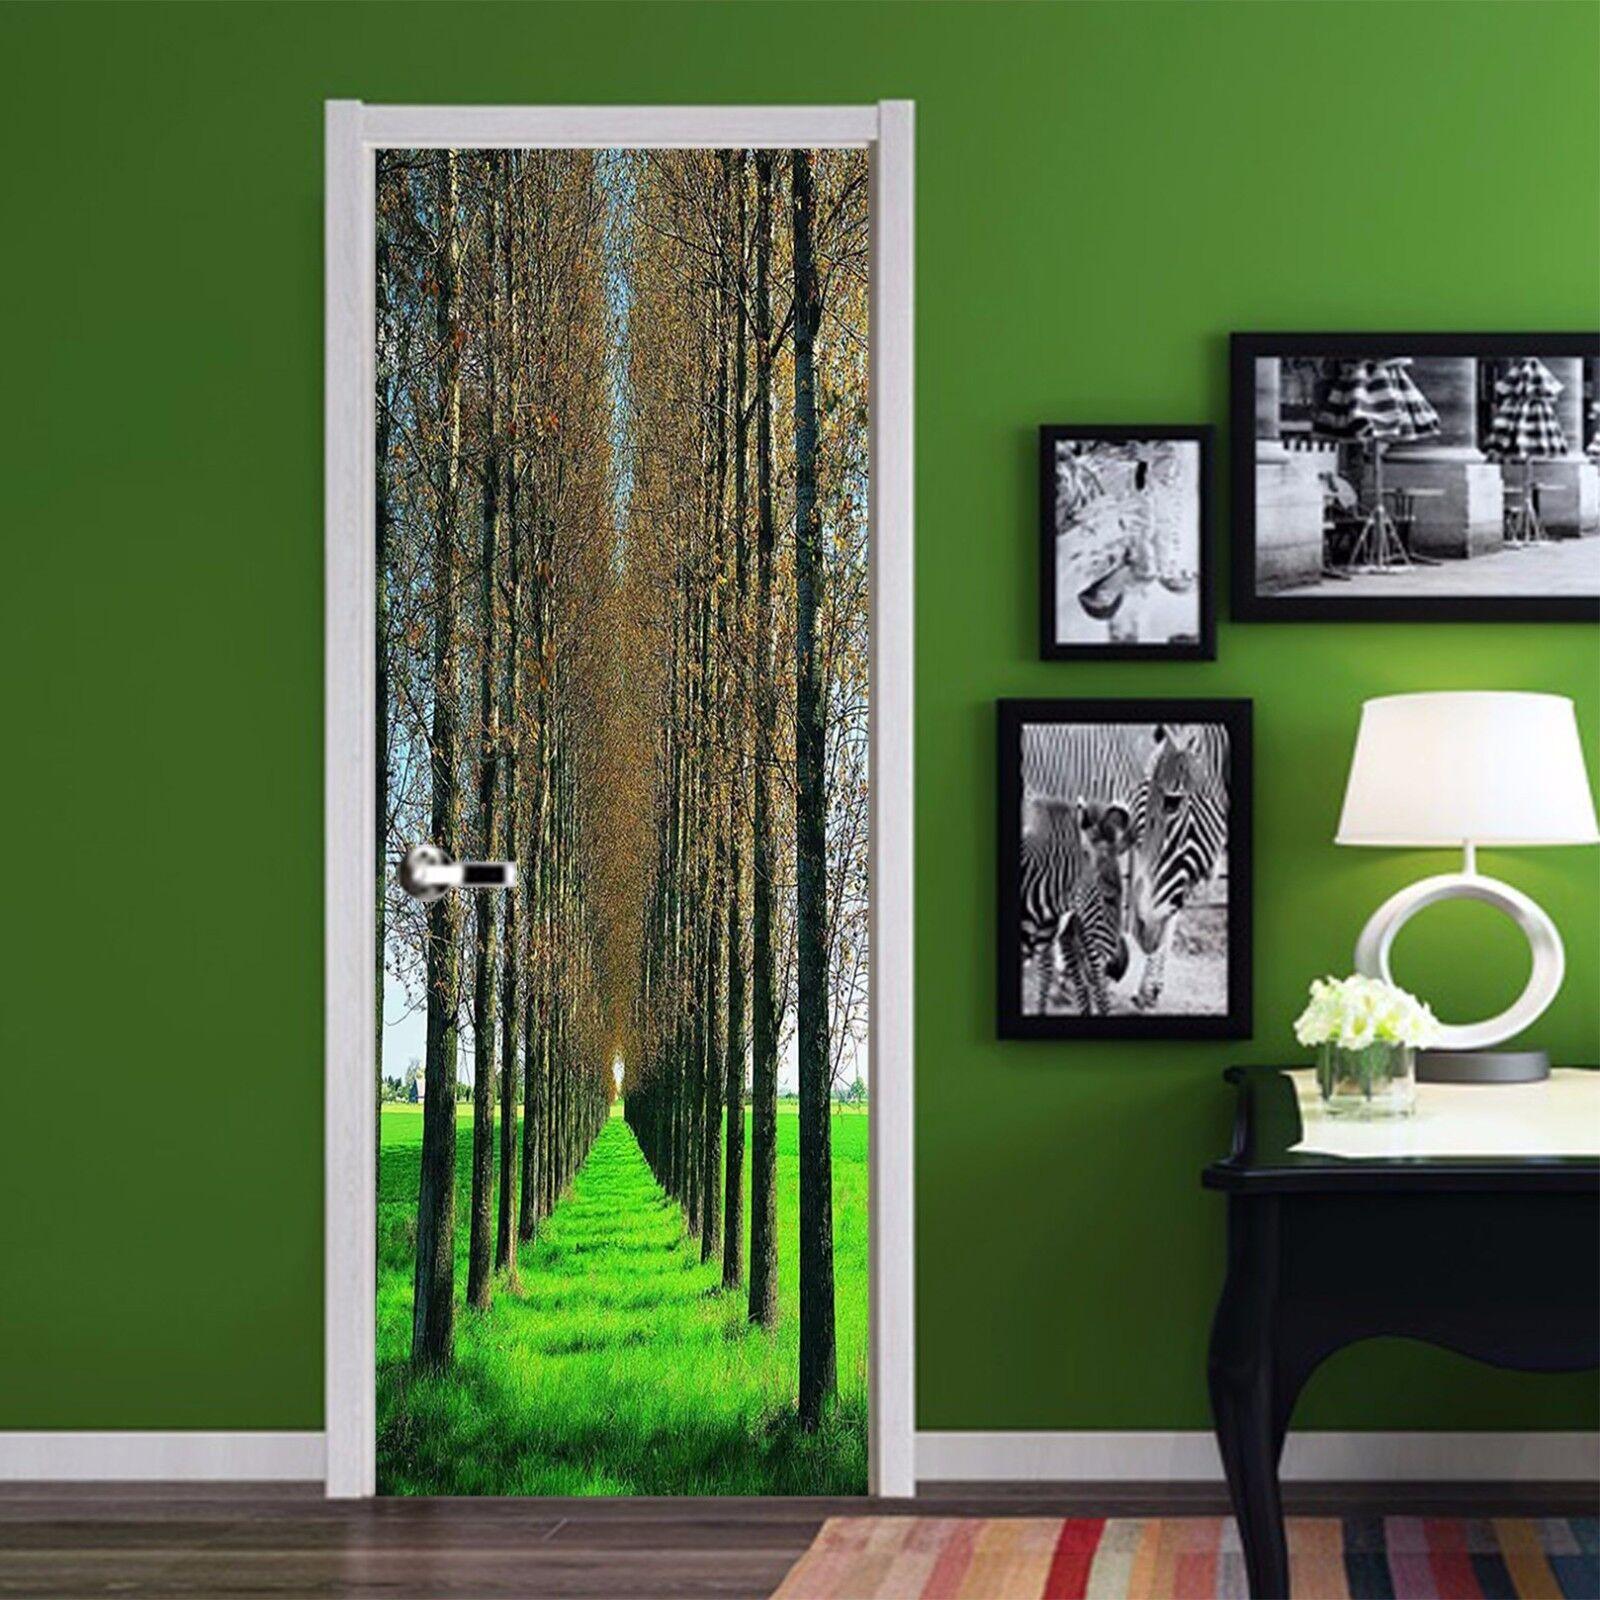 3D Grasland 770 Tür Wandmalerei Wandaufkleber Aufkleber AJ WALLPAPER DE Kyra